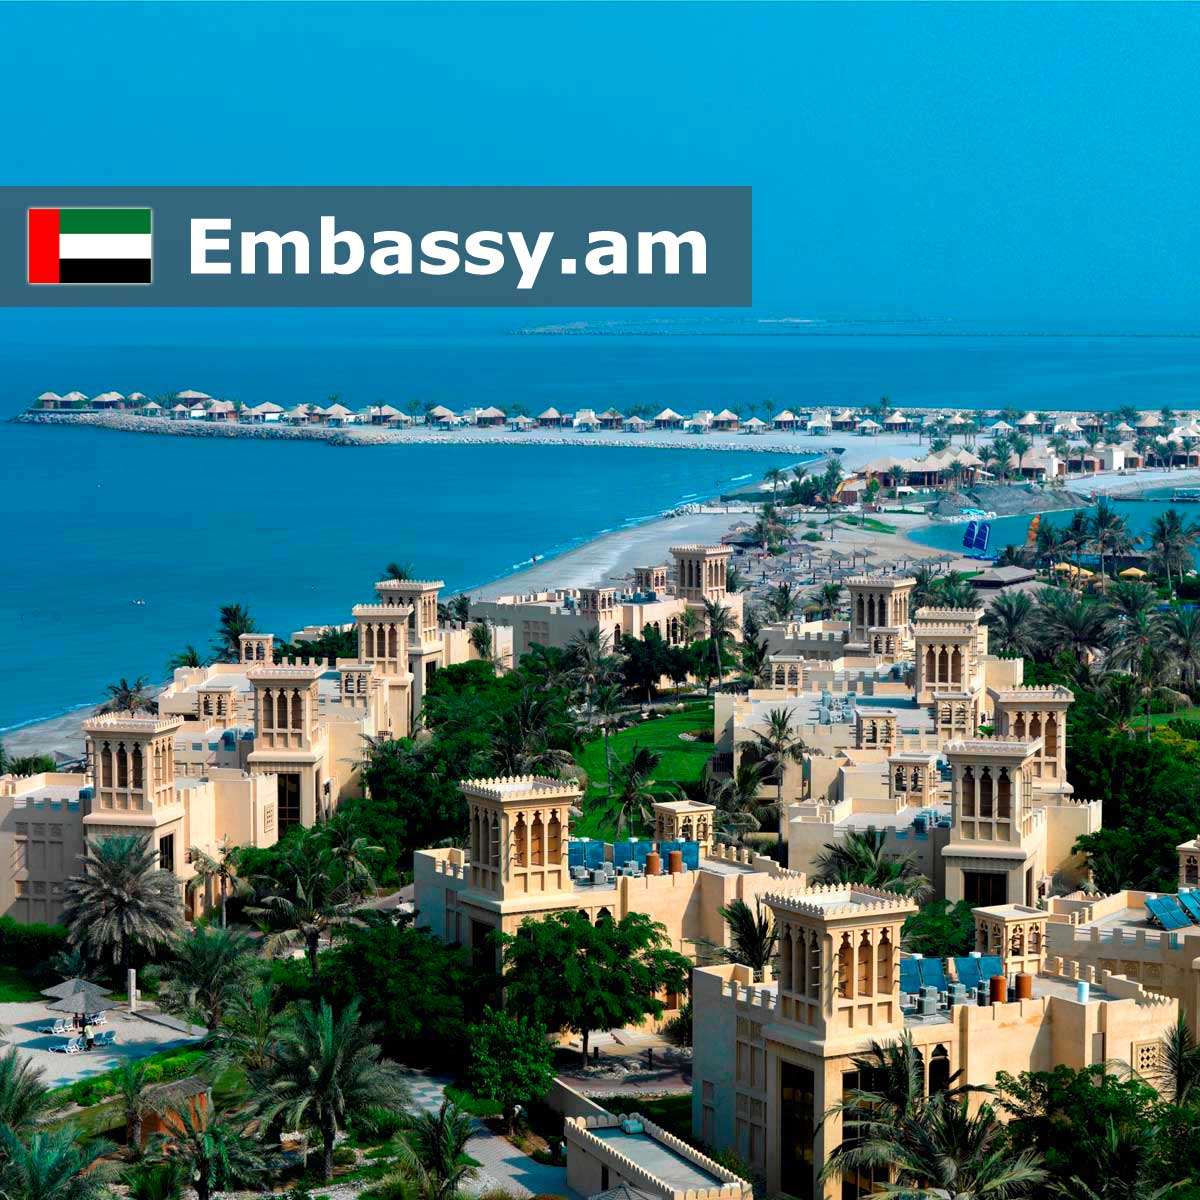 Ras Al Khaimah - Hotels in the United Arab Emirates - Embassy.am